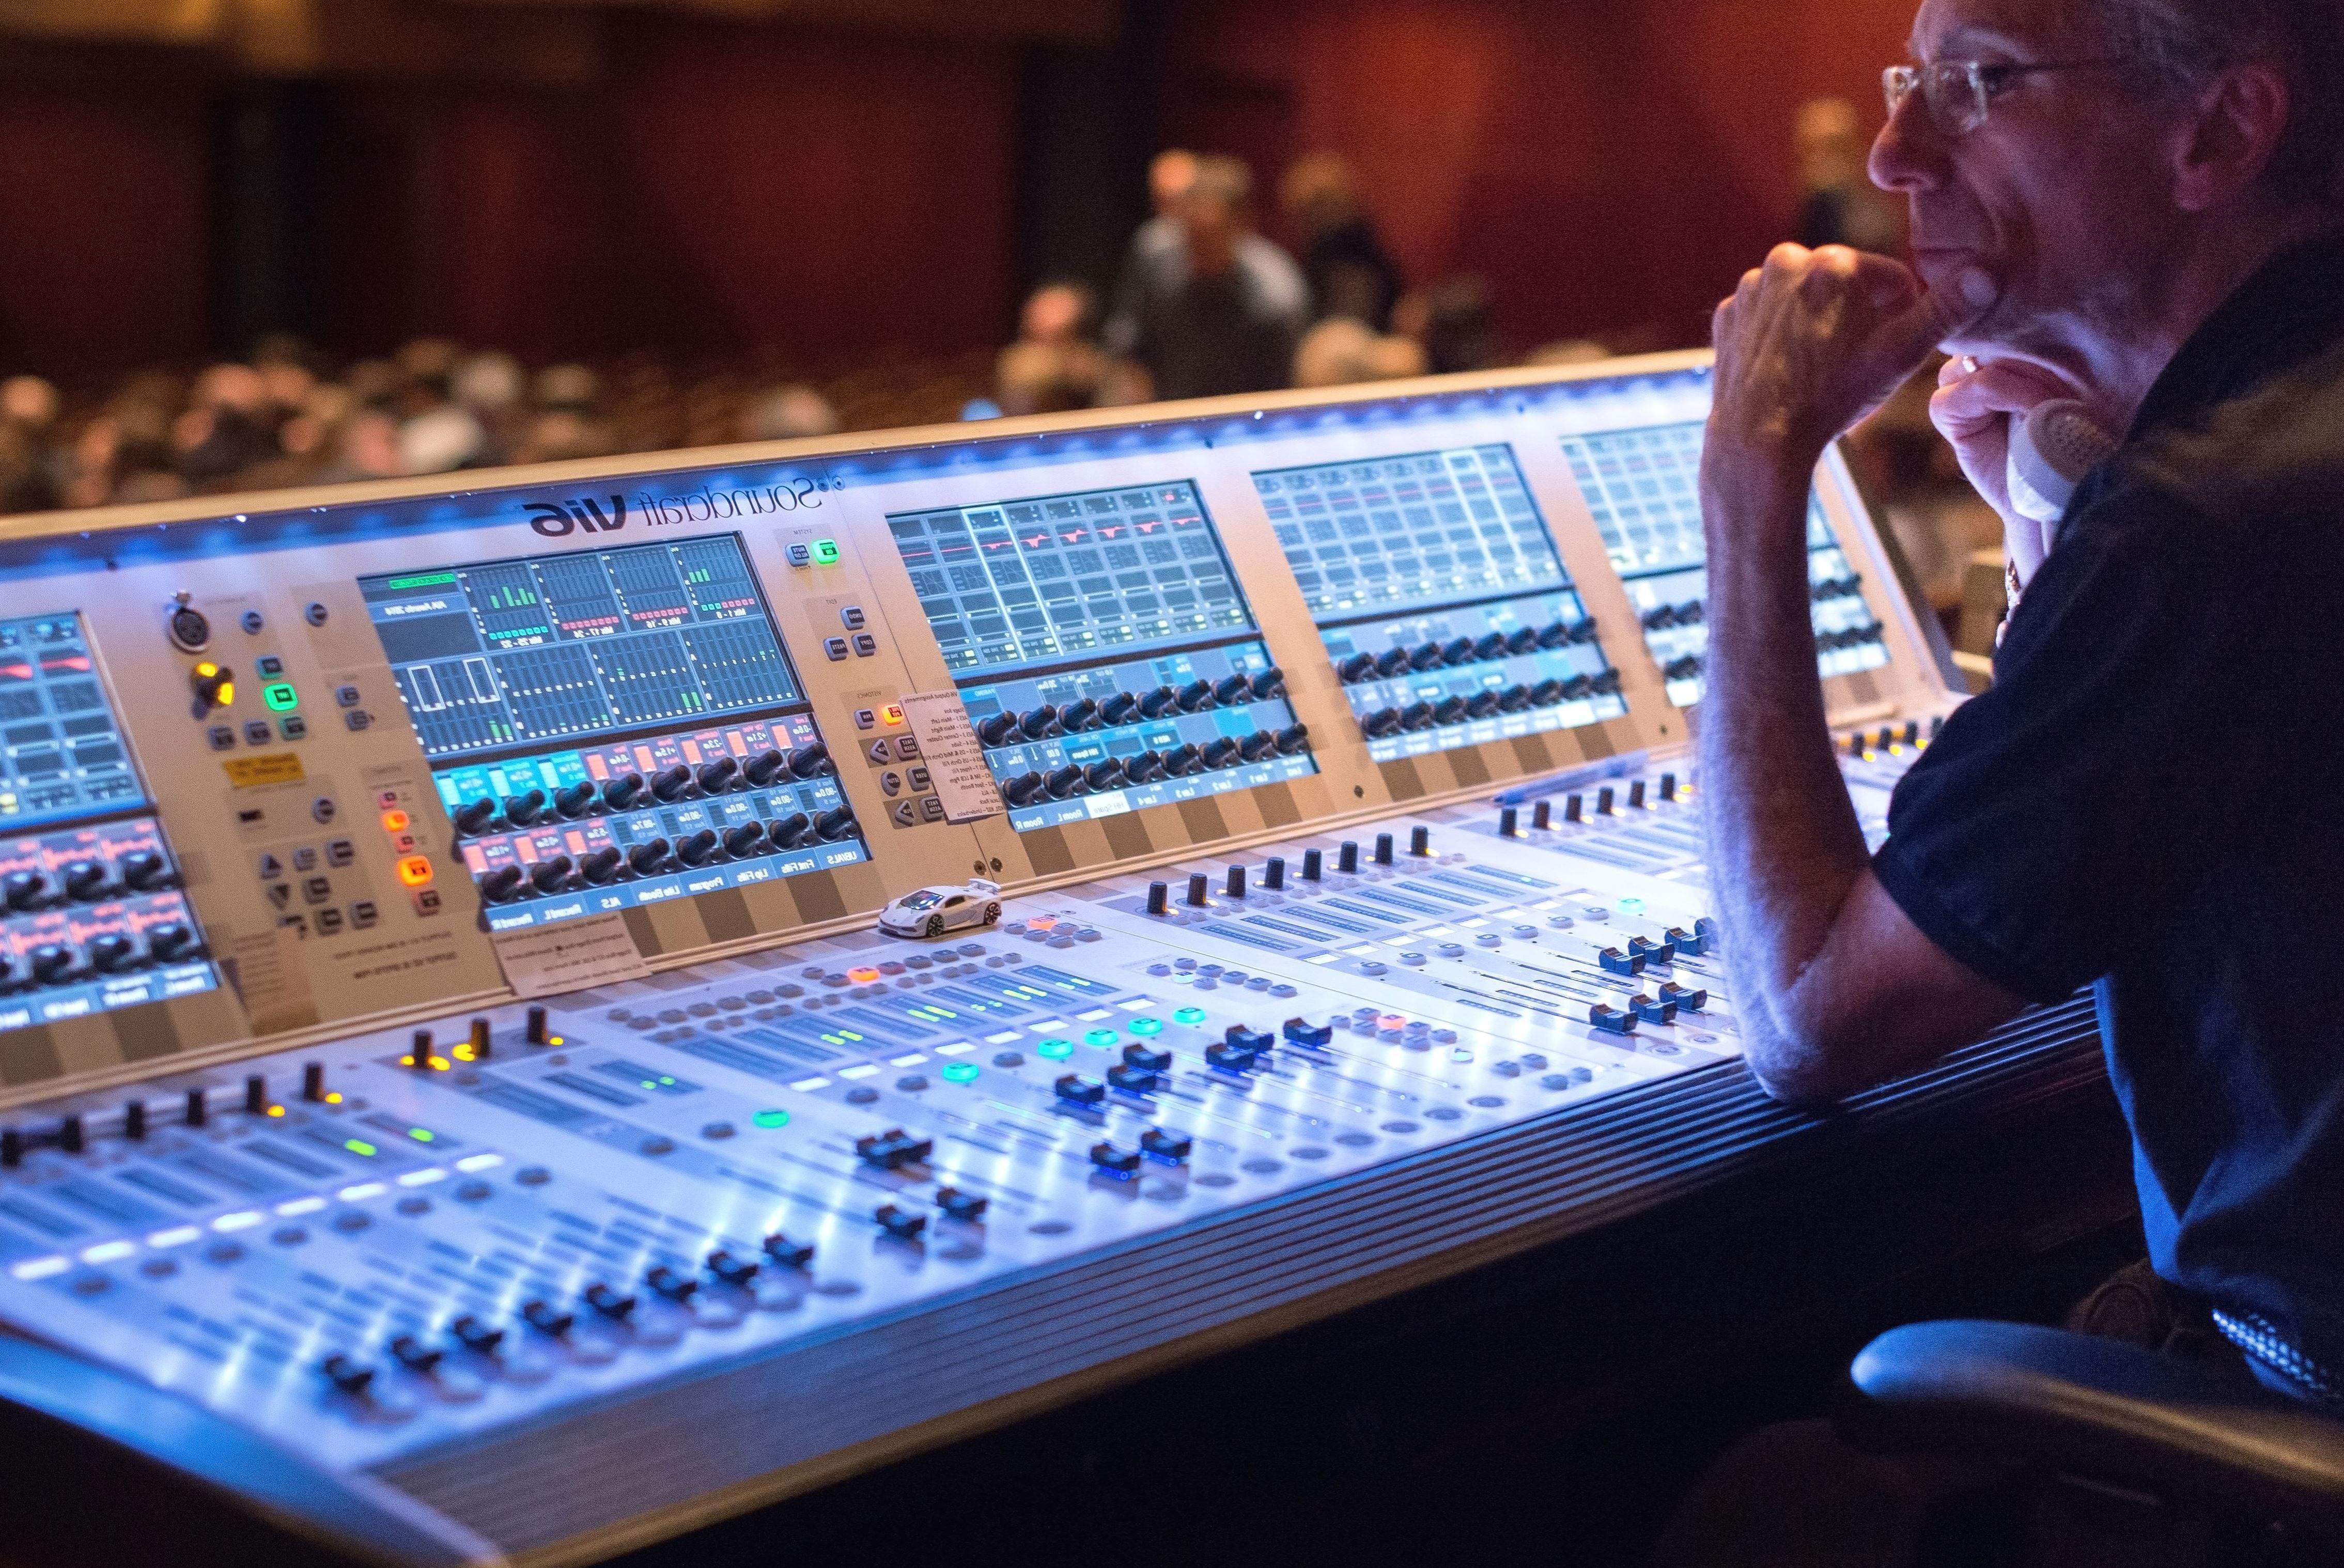 Imagen gratis audio concierto de msica panel de